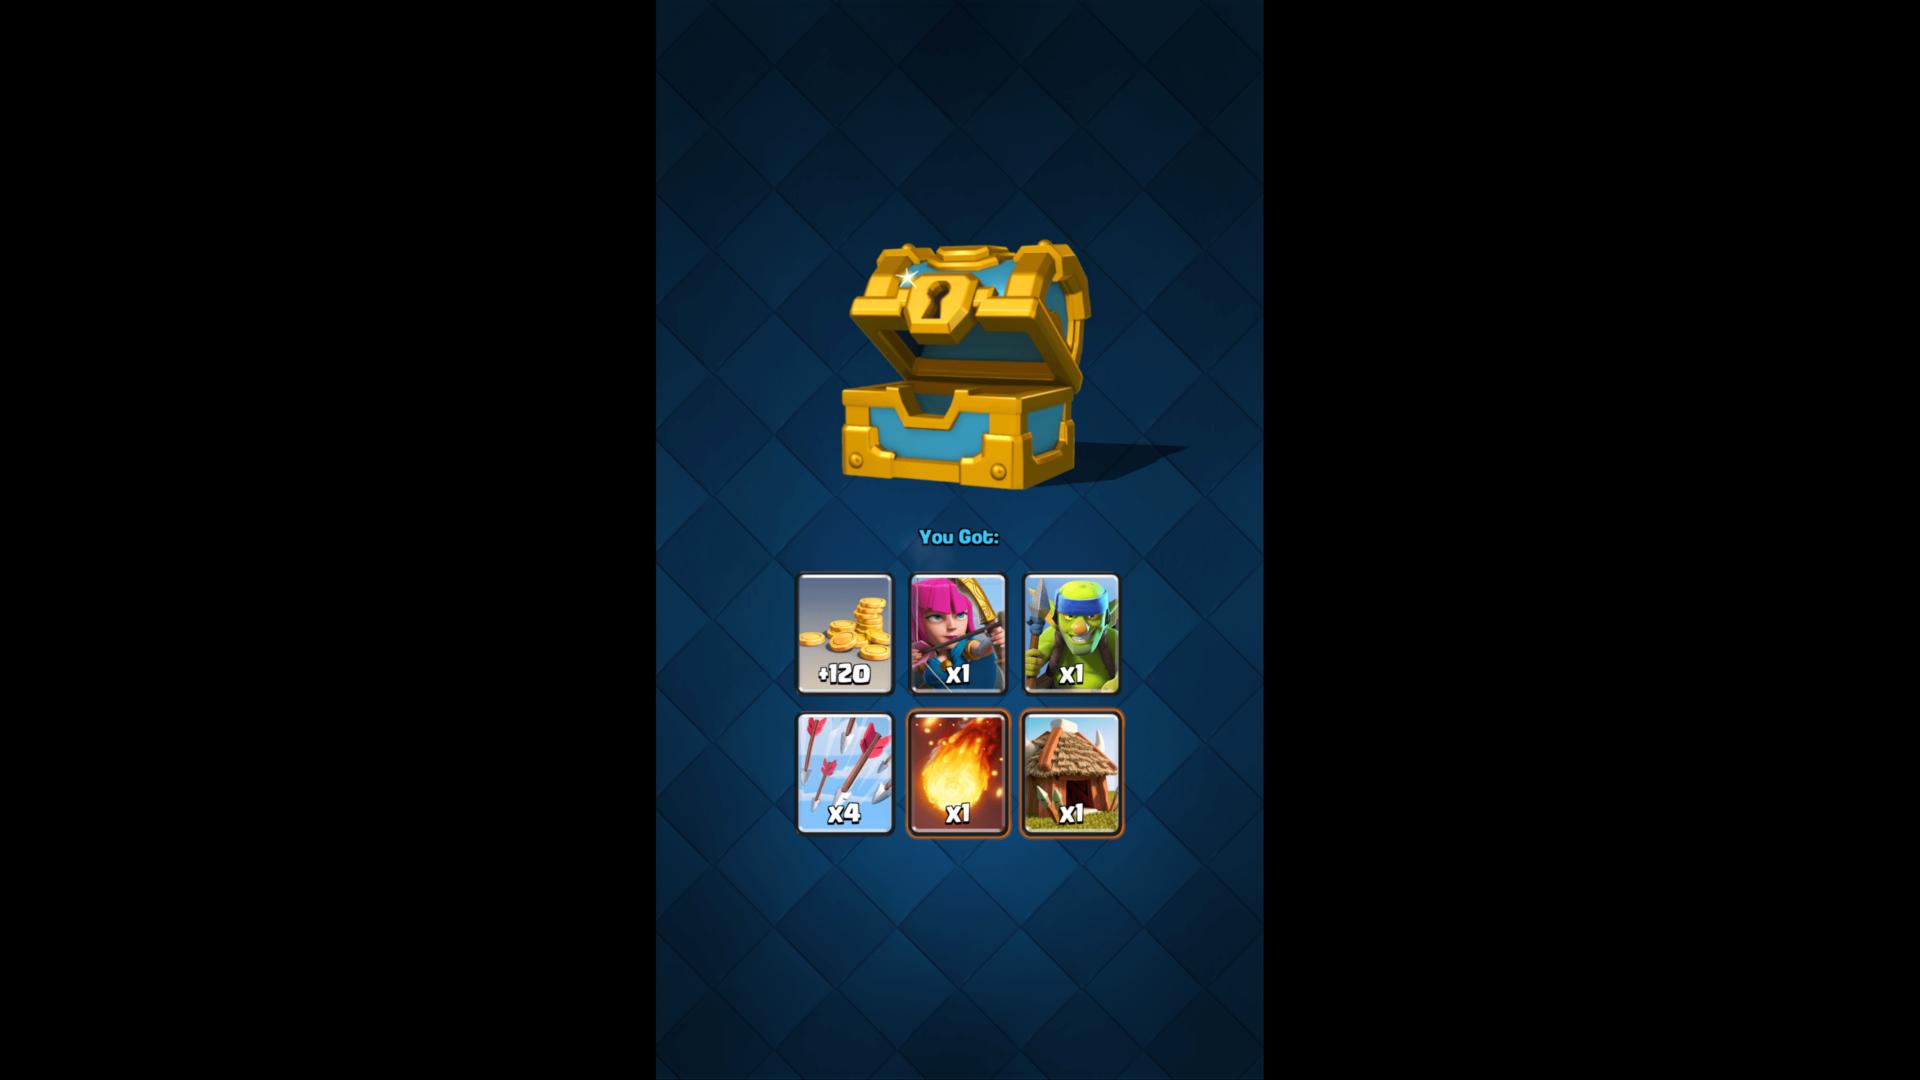 Chest reward screenshot of Clash Royale video game interface.